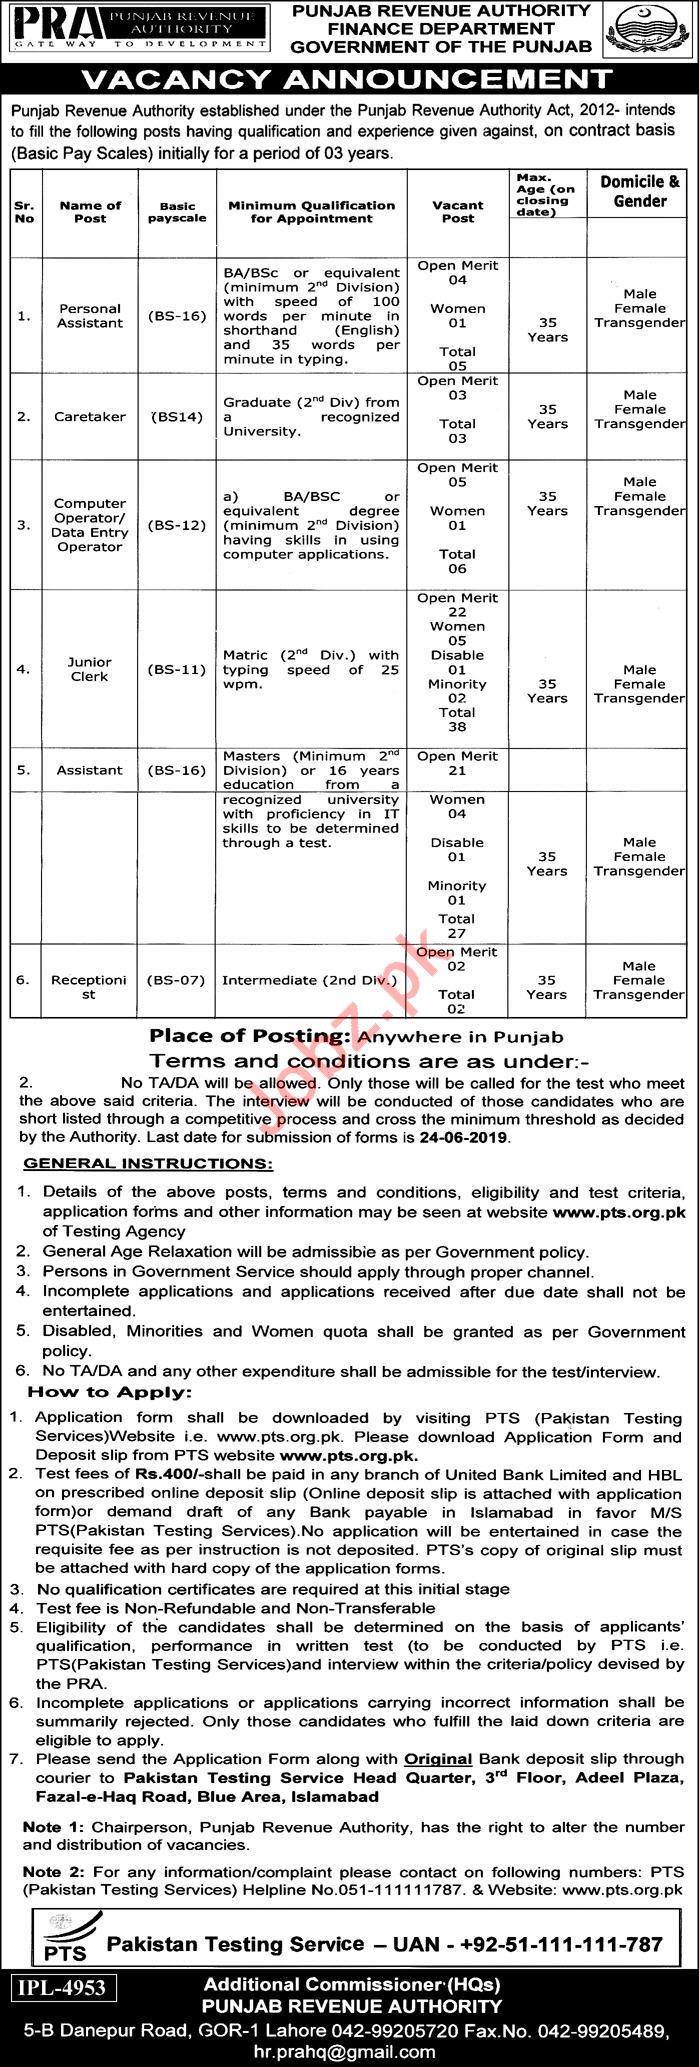 Punjab Revenue Authority PRA Clerical Jobs 2019 Via PTS